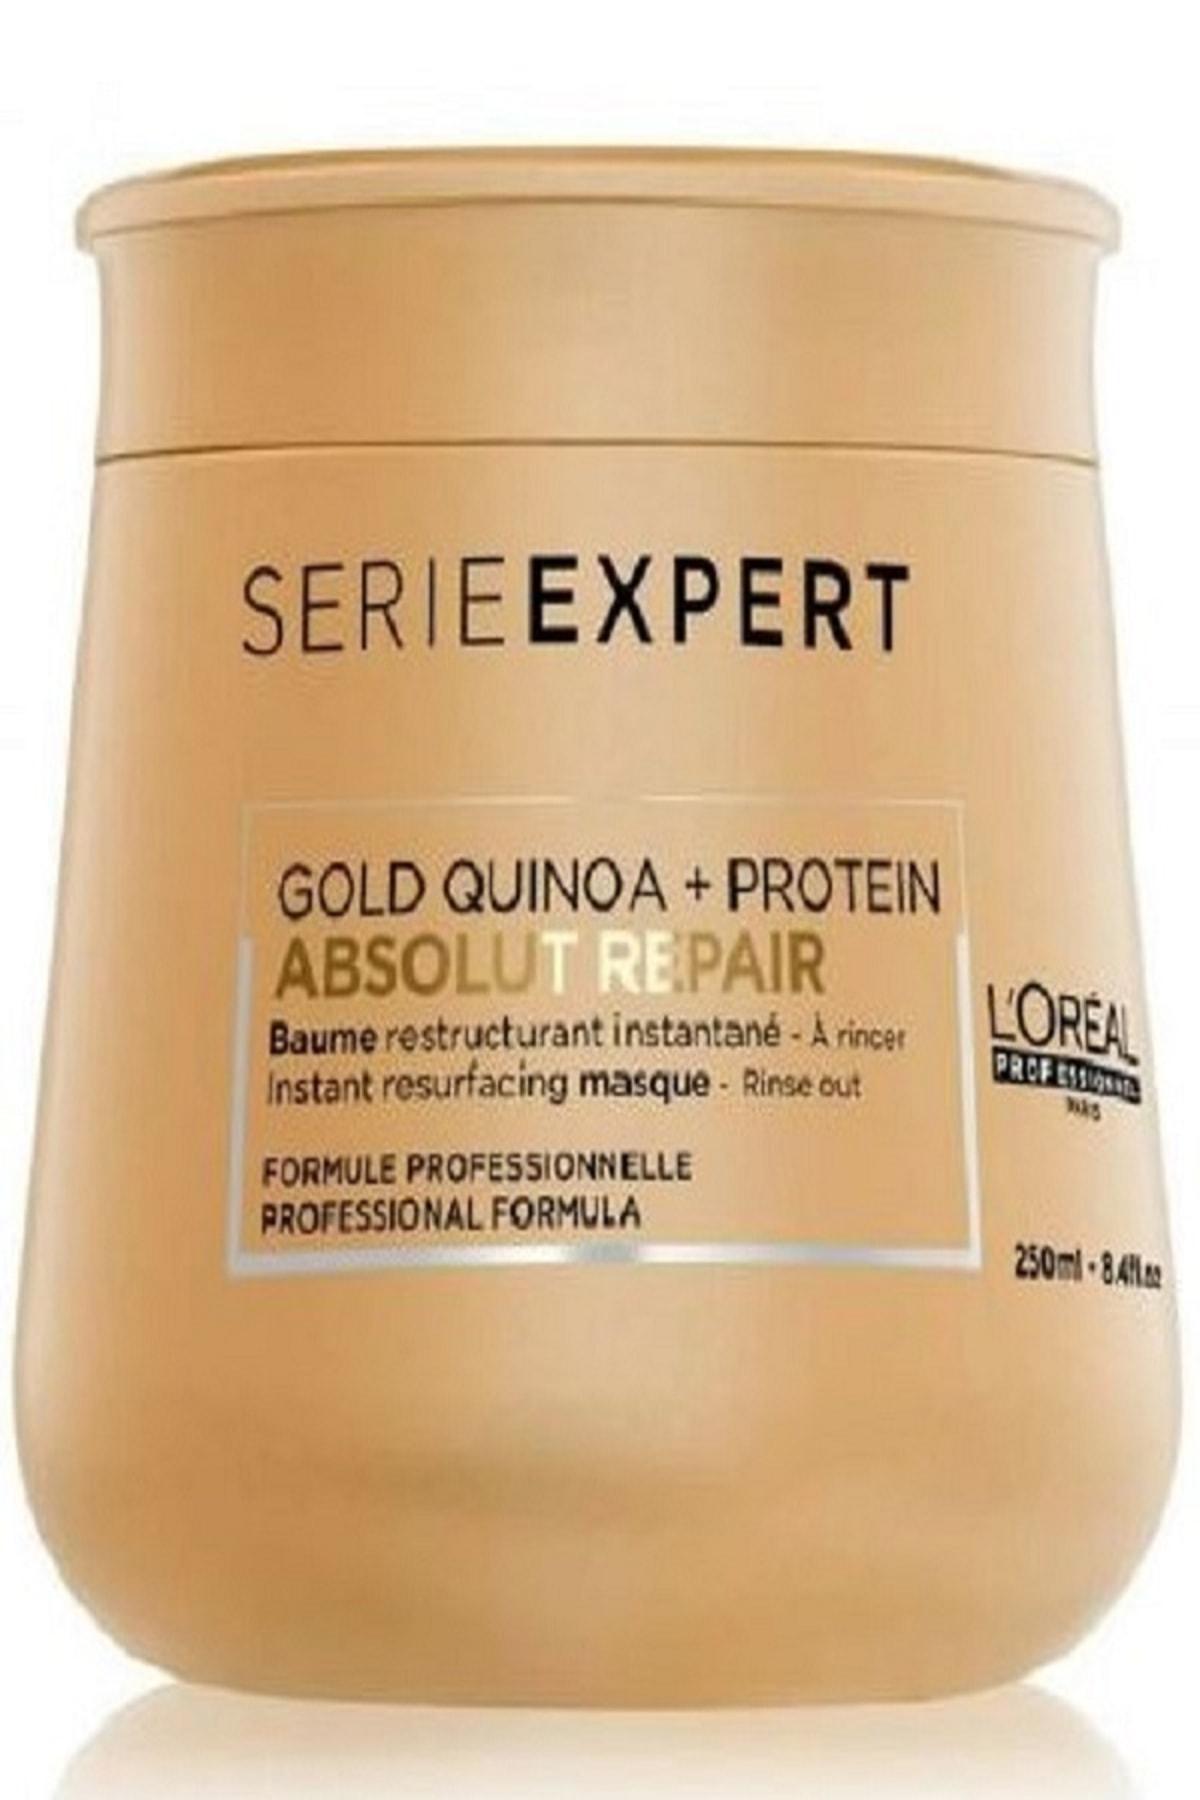 L'oreal Professionnel Yıpranmış Saçlar için Onarıcı Maske 250 ml - Absolut Repair Gold Quinoa+Protein Masque 3474636481774 1